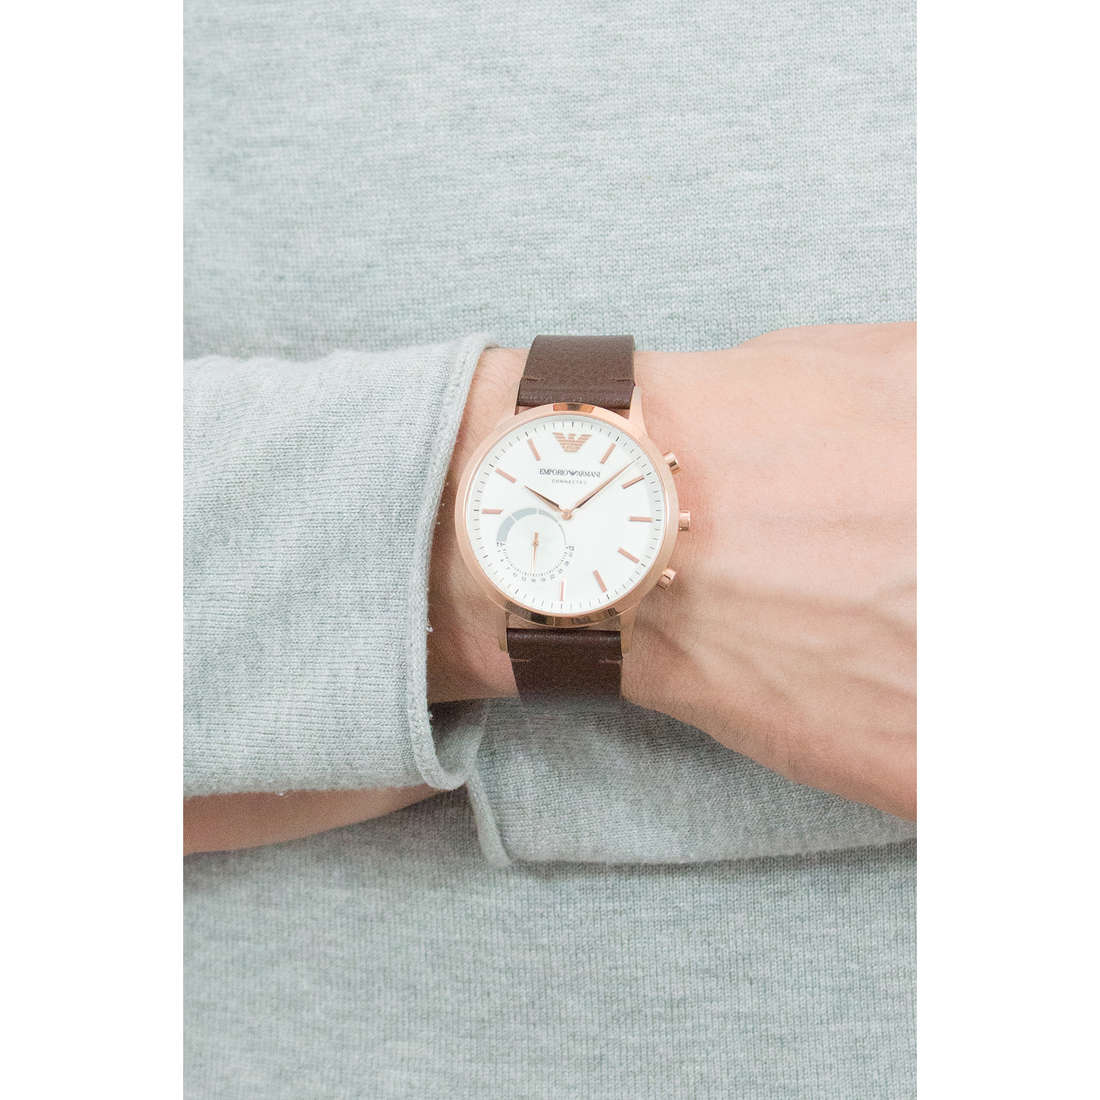 Emporio Armani Smartwatches uomo ART3002 indosso